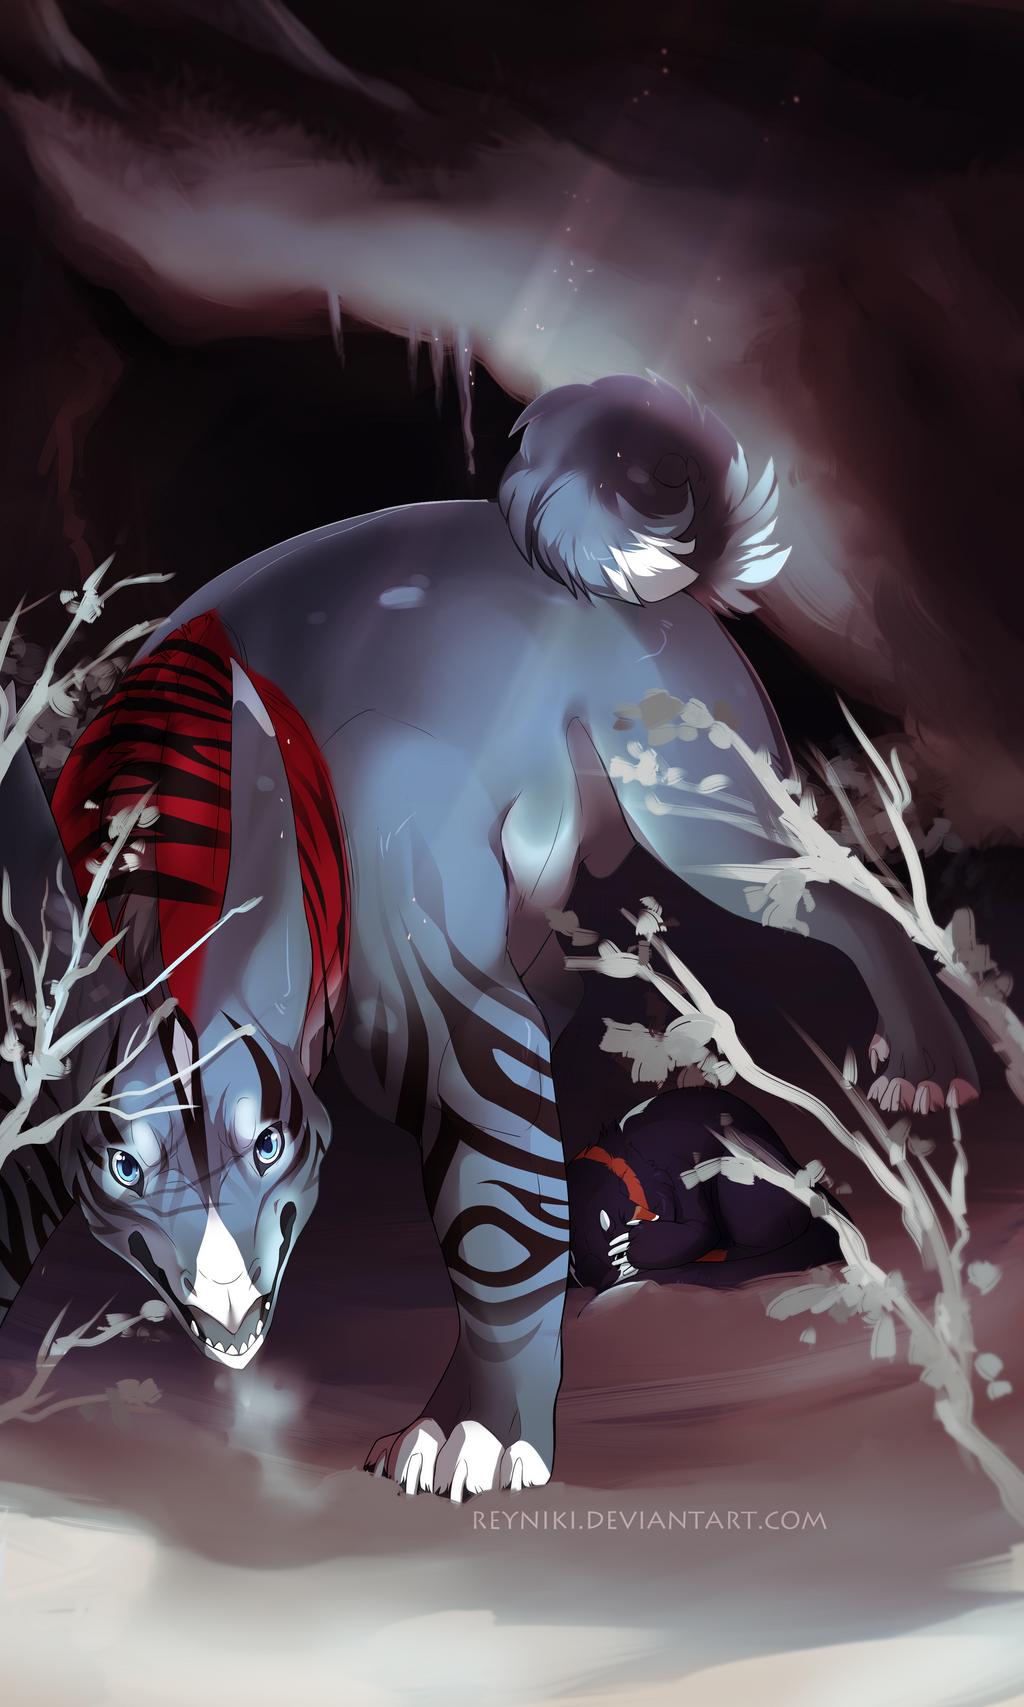 [ARPG] Striped Guardian by Reyniki